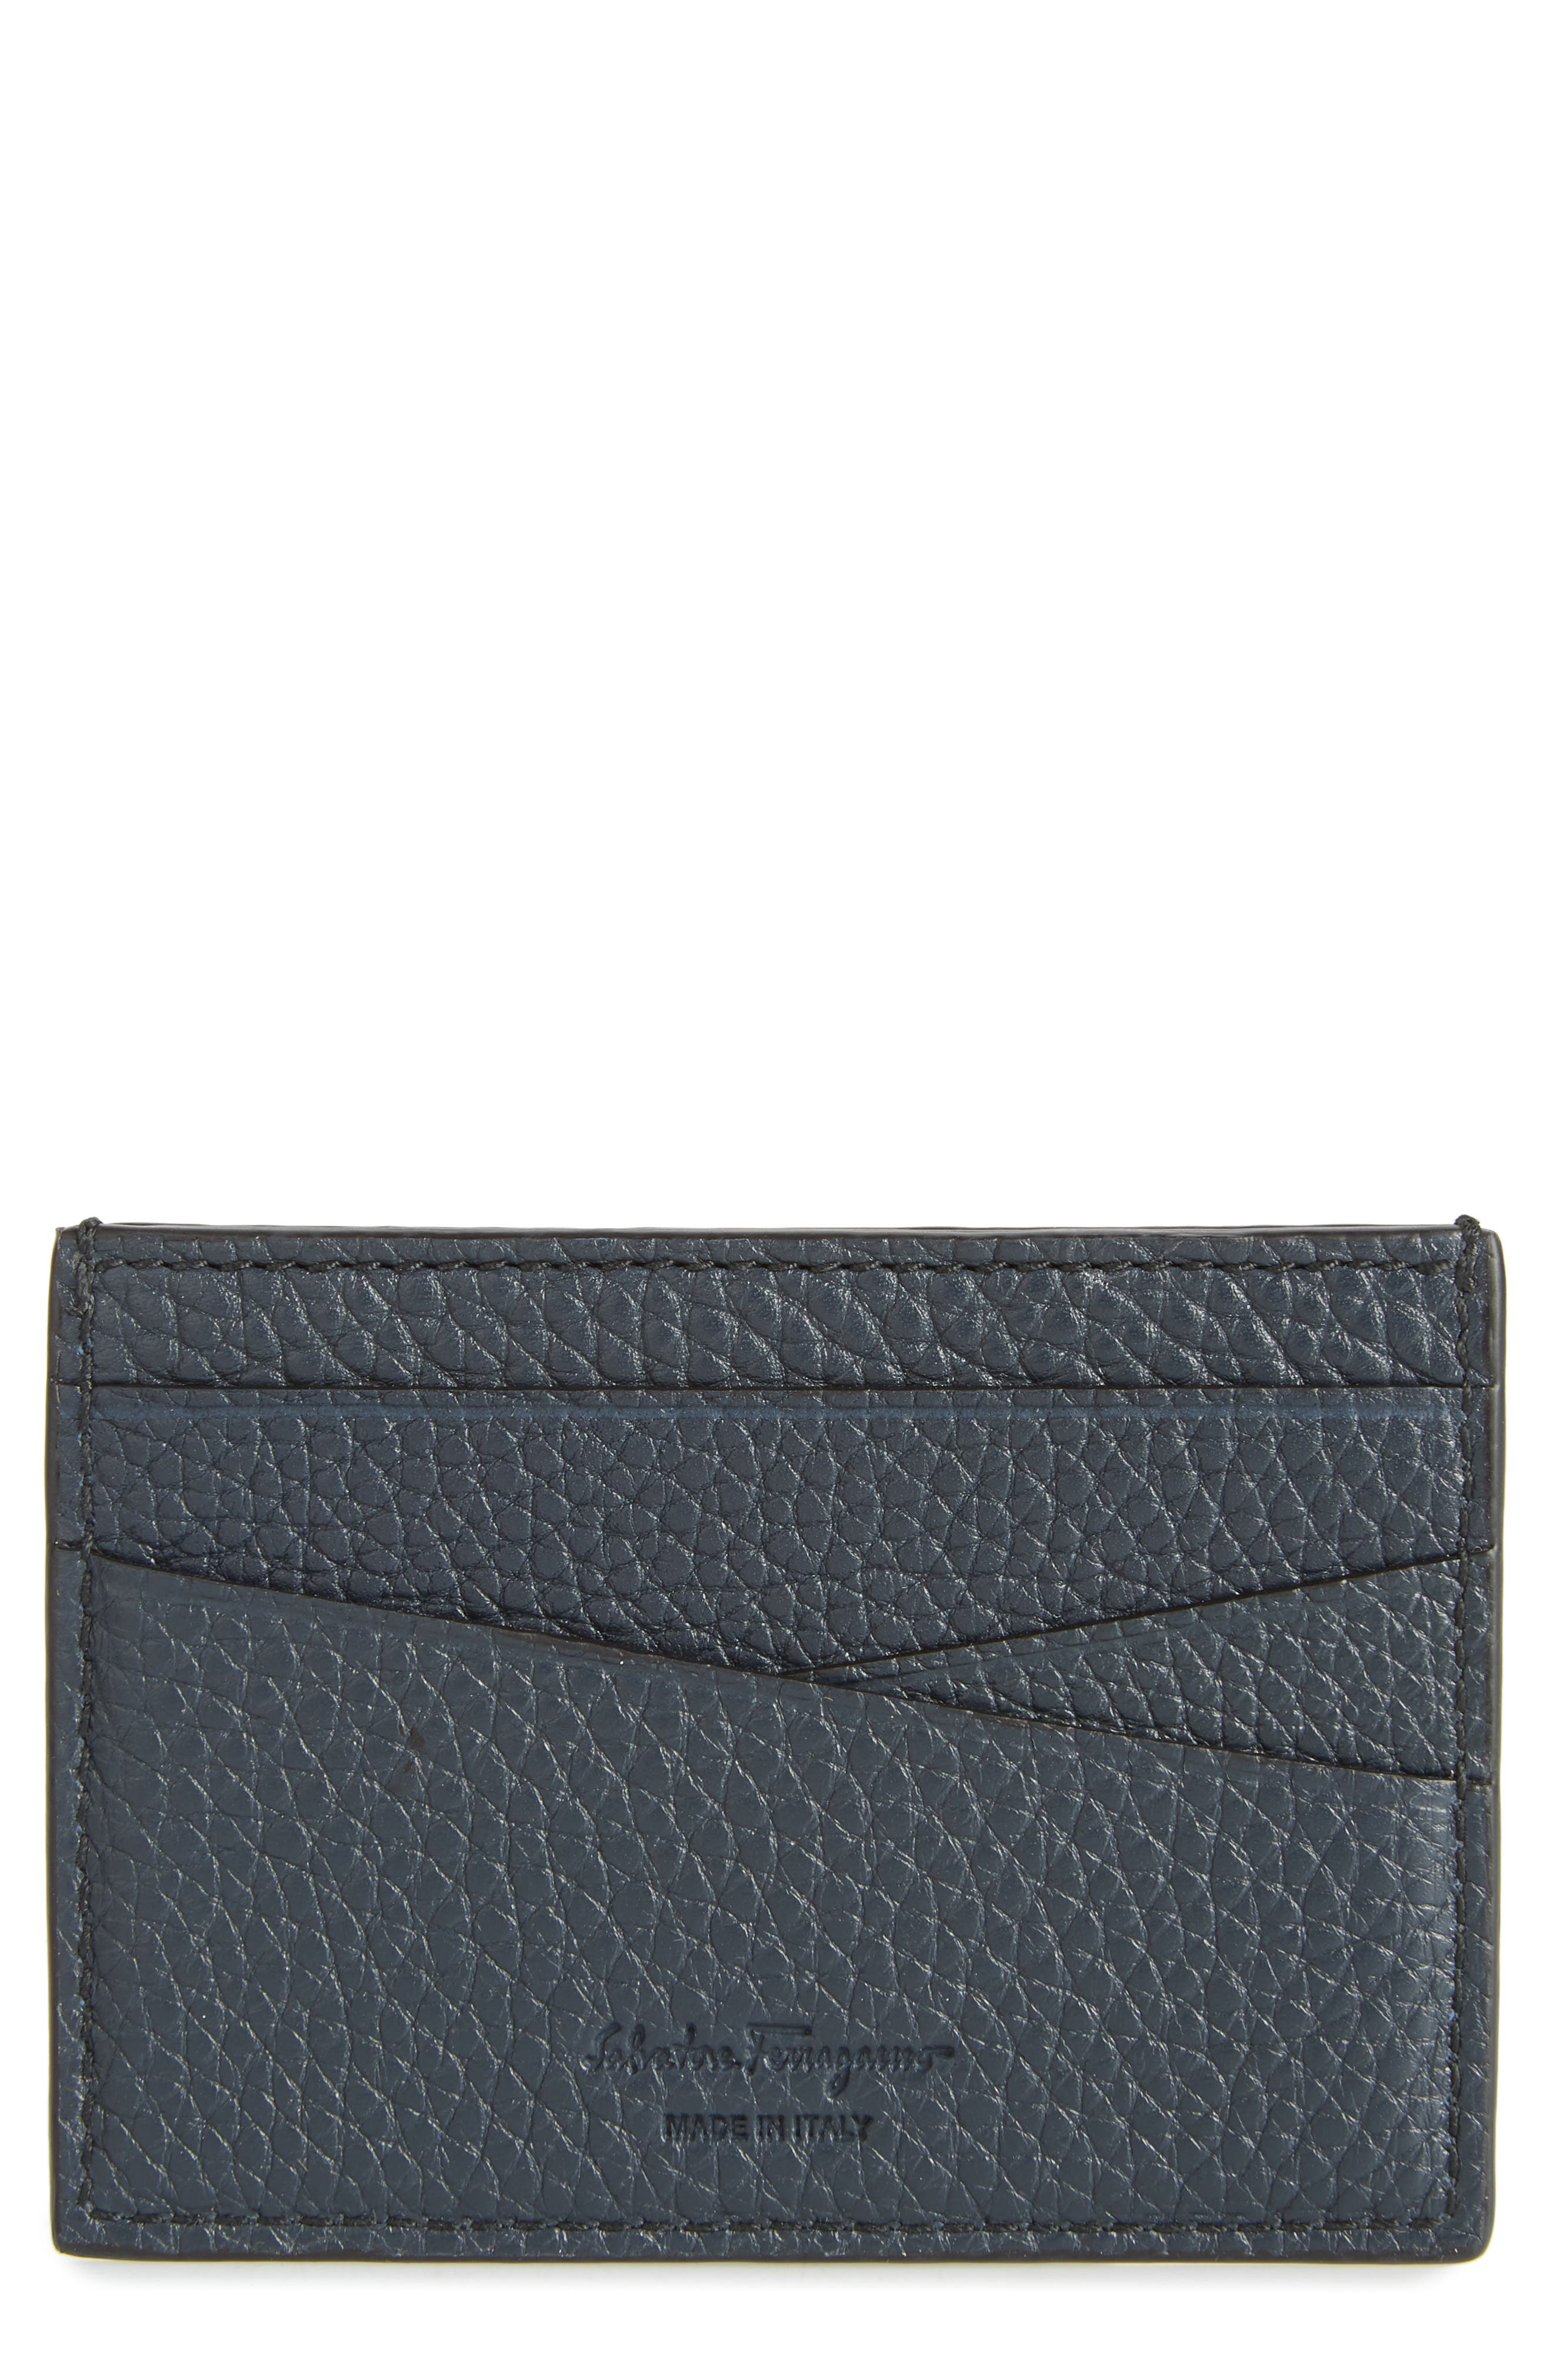 SALVATORE FERRAGAMO, New Firenze Leather Card Case, Main thumbnail 1, color, NAVY/NERO